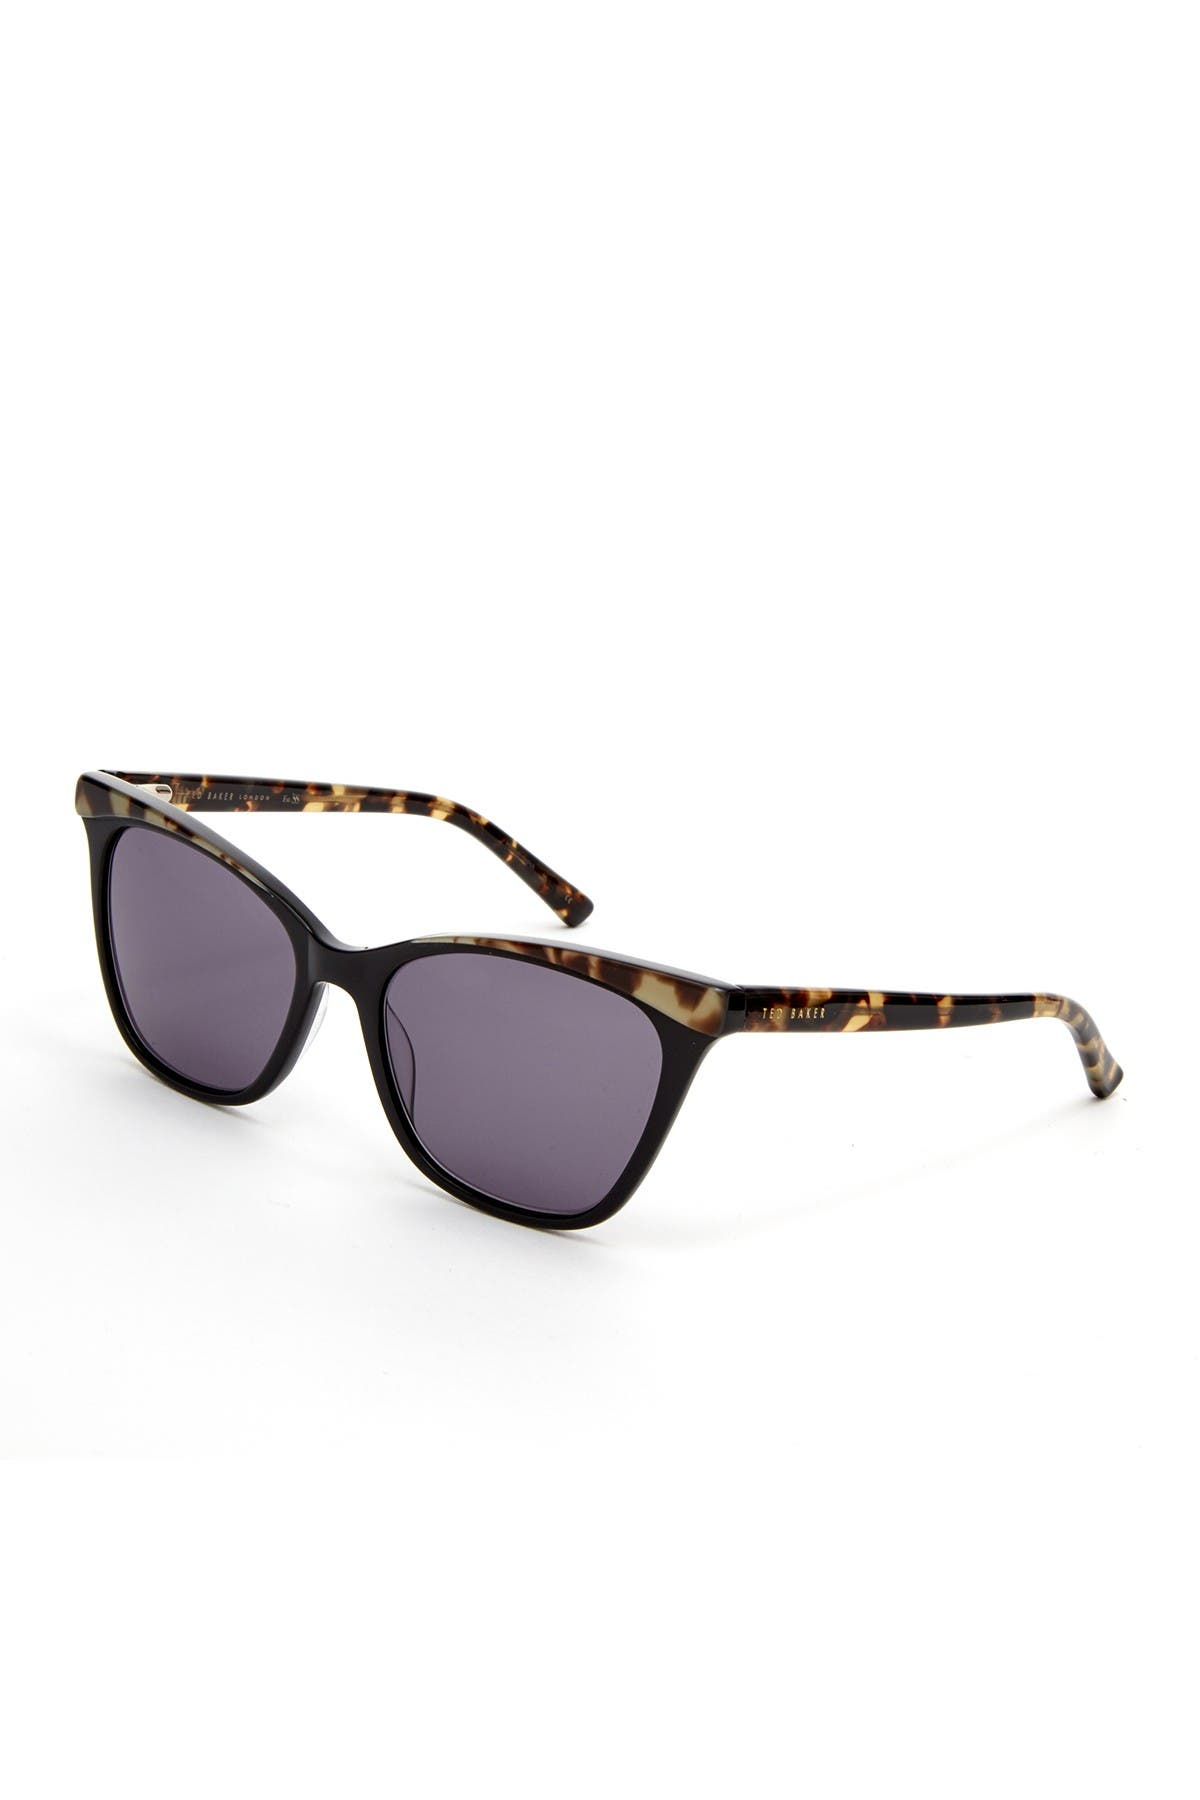 Image of Ted Baker London 57mm Plastic Square Cat Eye Sunglasses